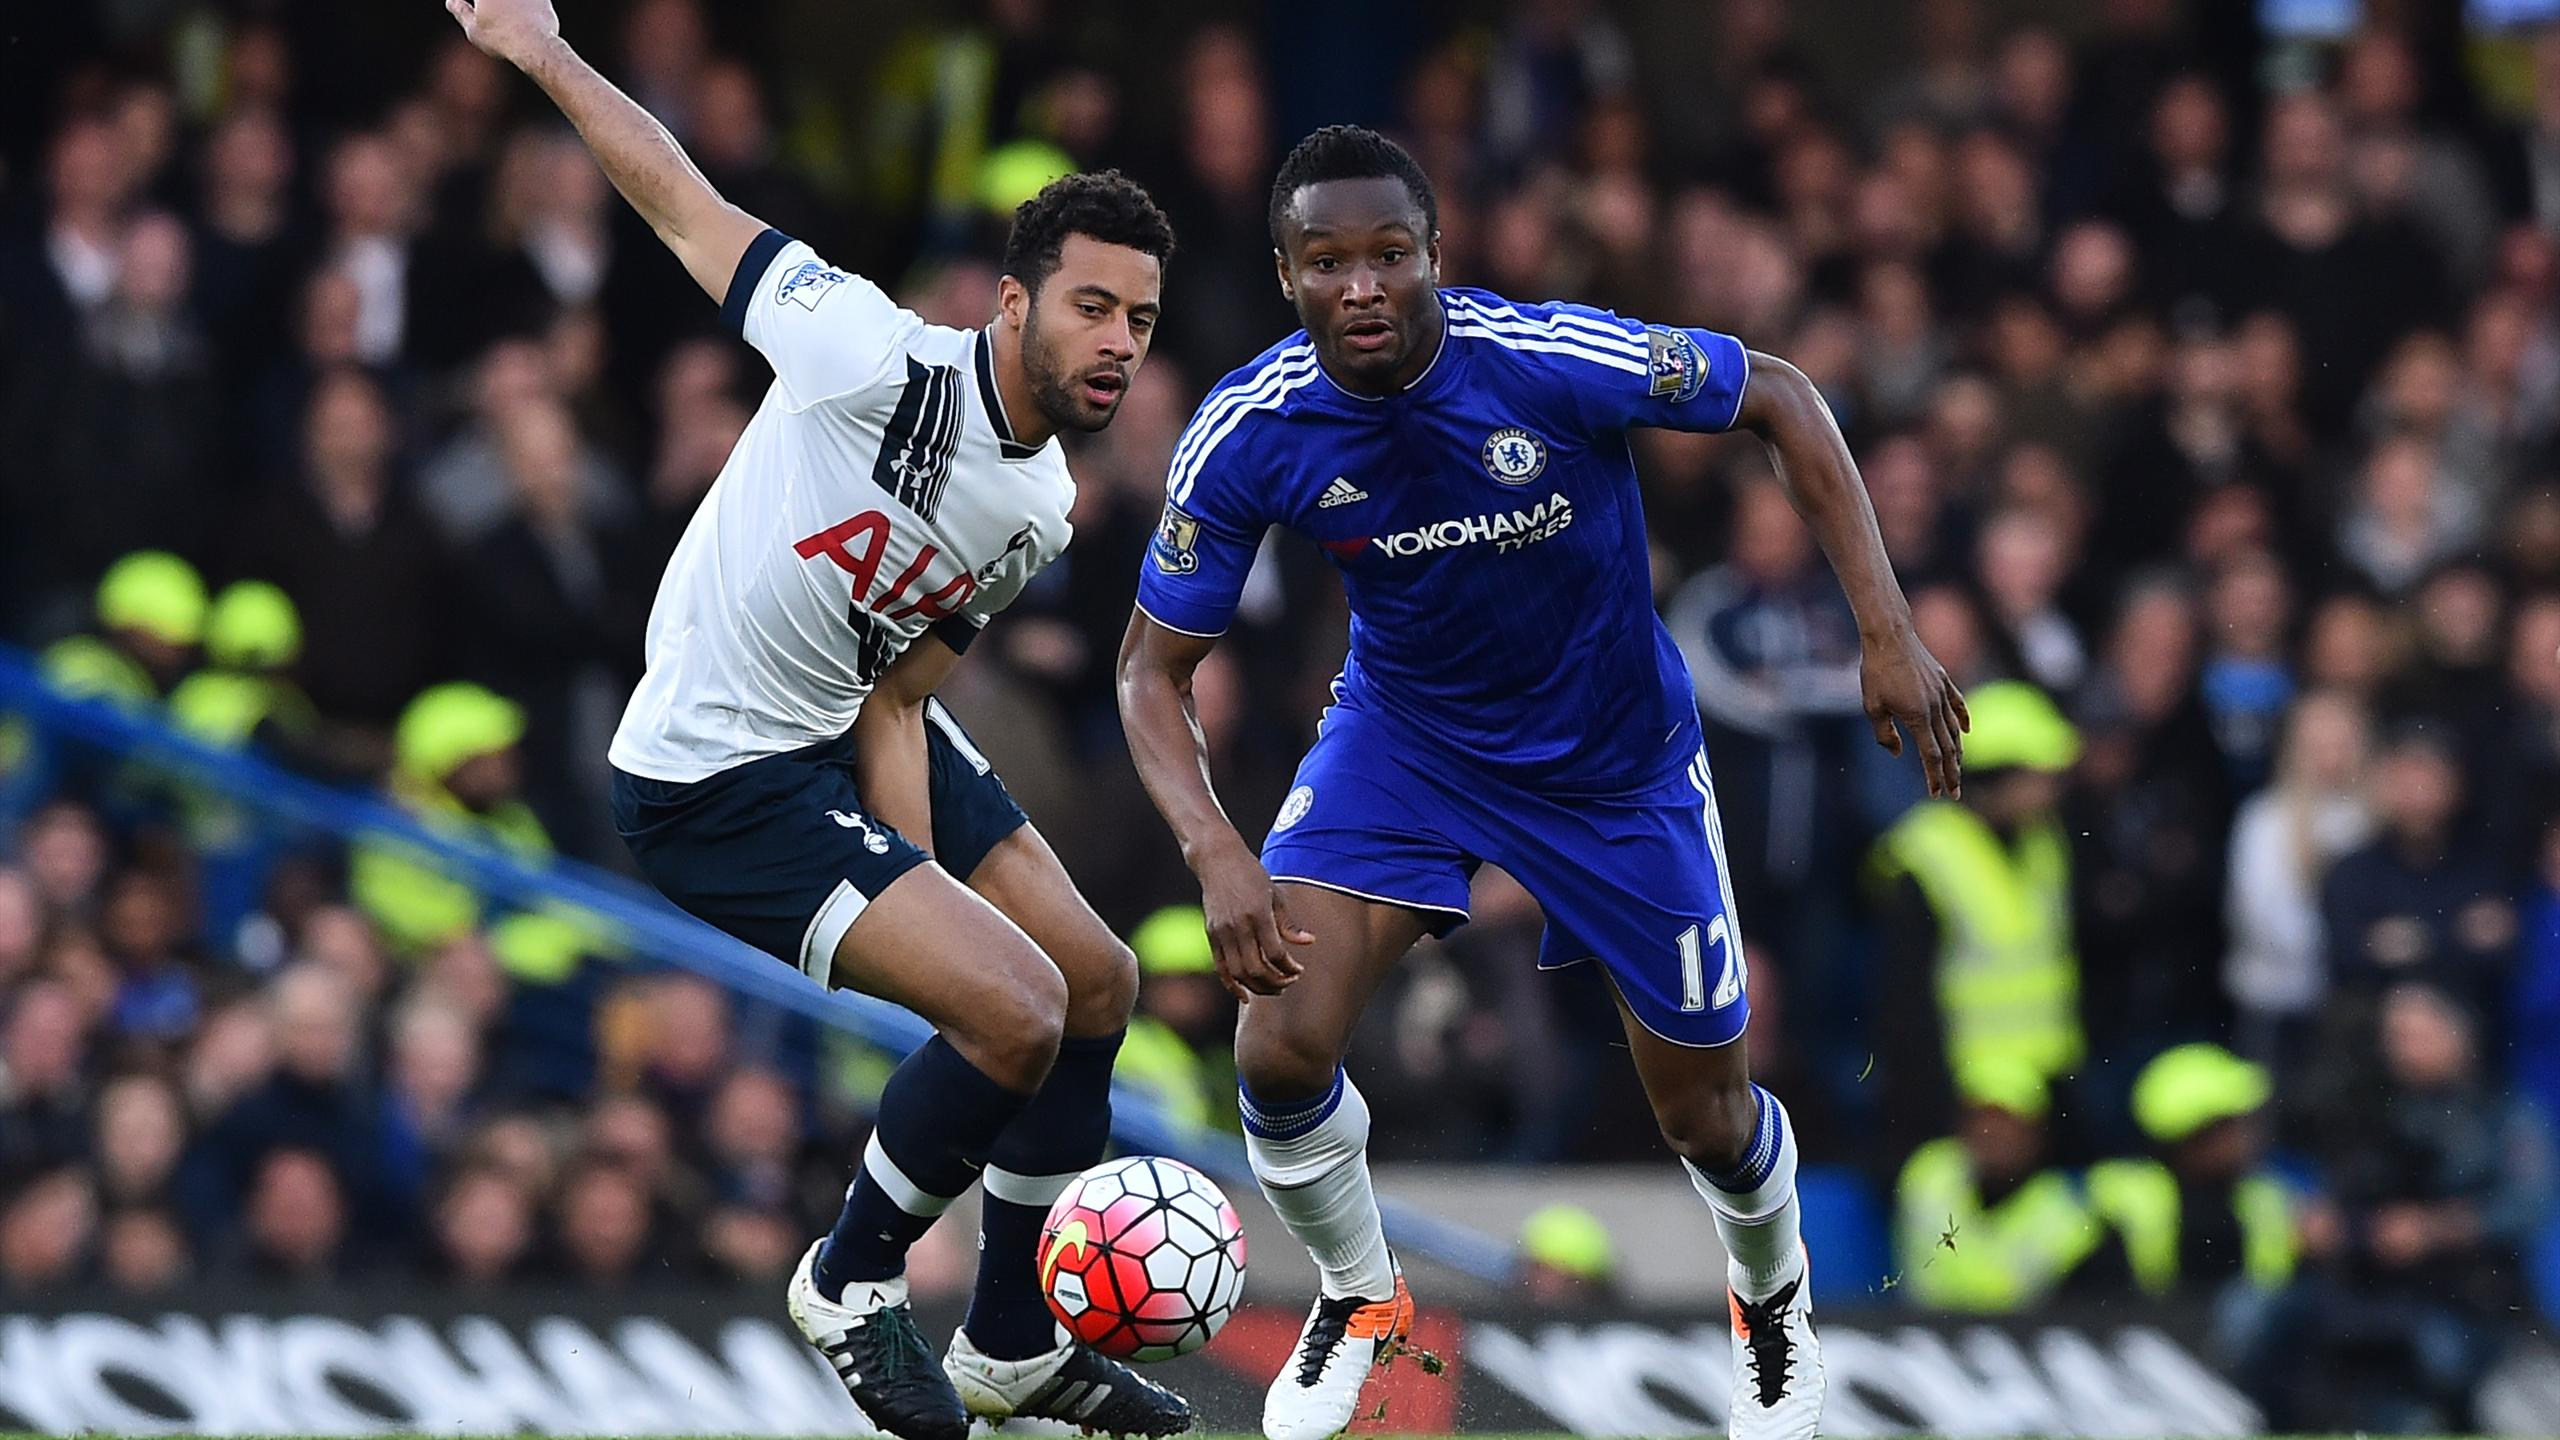 Tottenham Hotspur's Belgian midfielder Mousa Dembele (L) vies with Chelsea's Nigerian midfielder John Obi Mikel